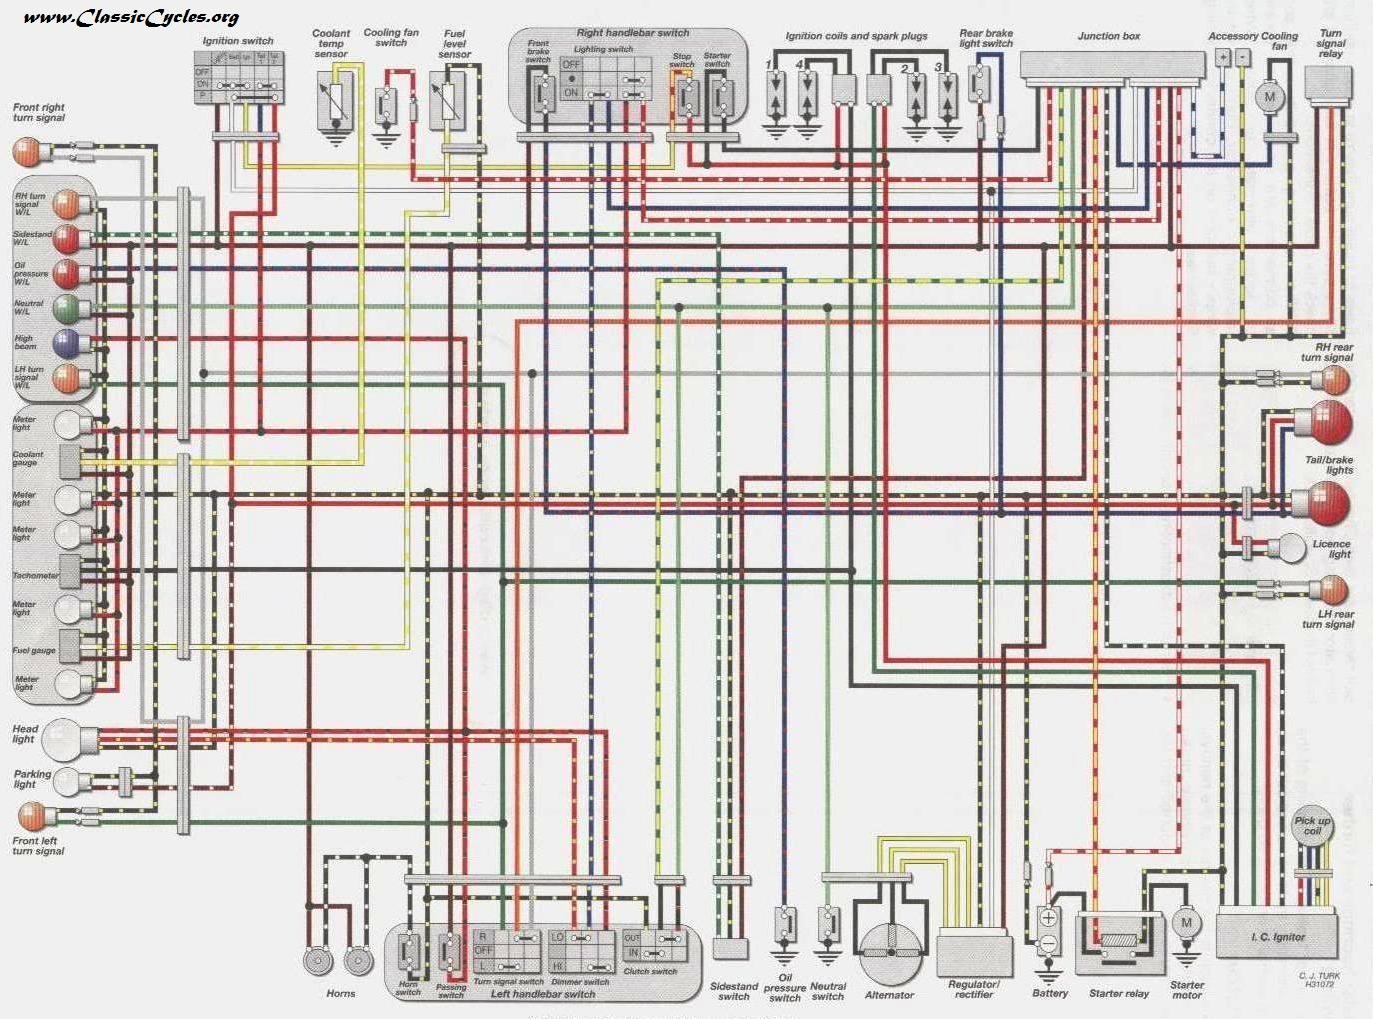 Wiring Diagram For Kawasaki Klf 300